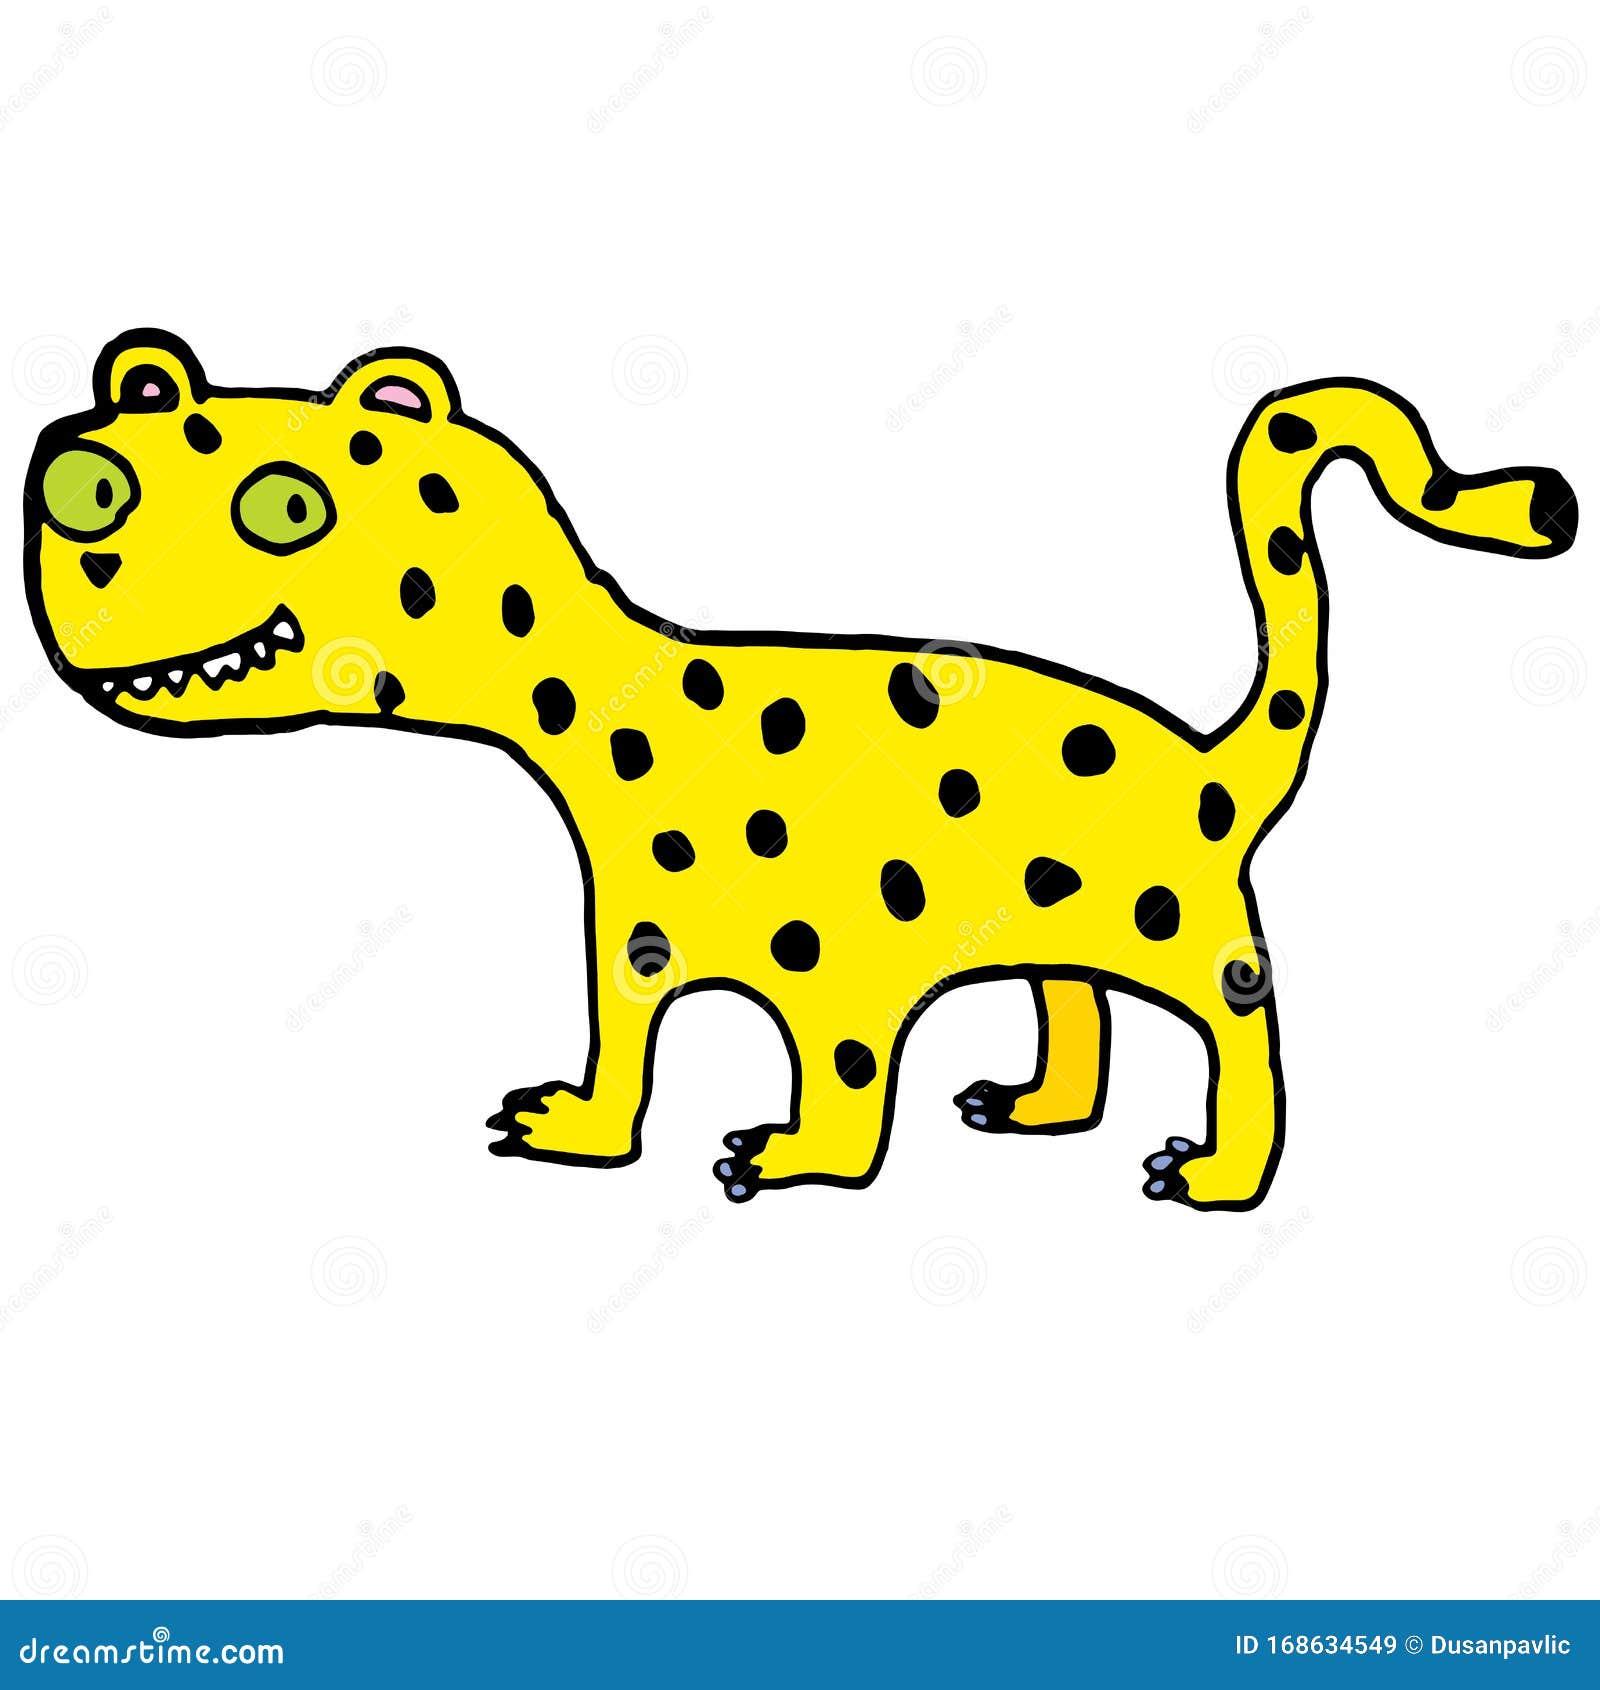 Cute Doddle Draw Of Jaguar Stock Vector Illustration Of Cartoon